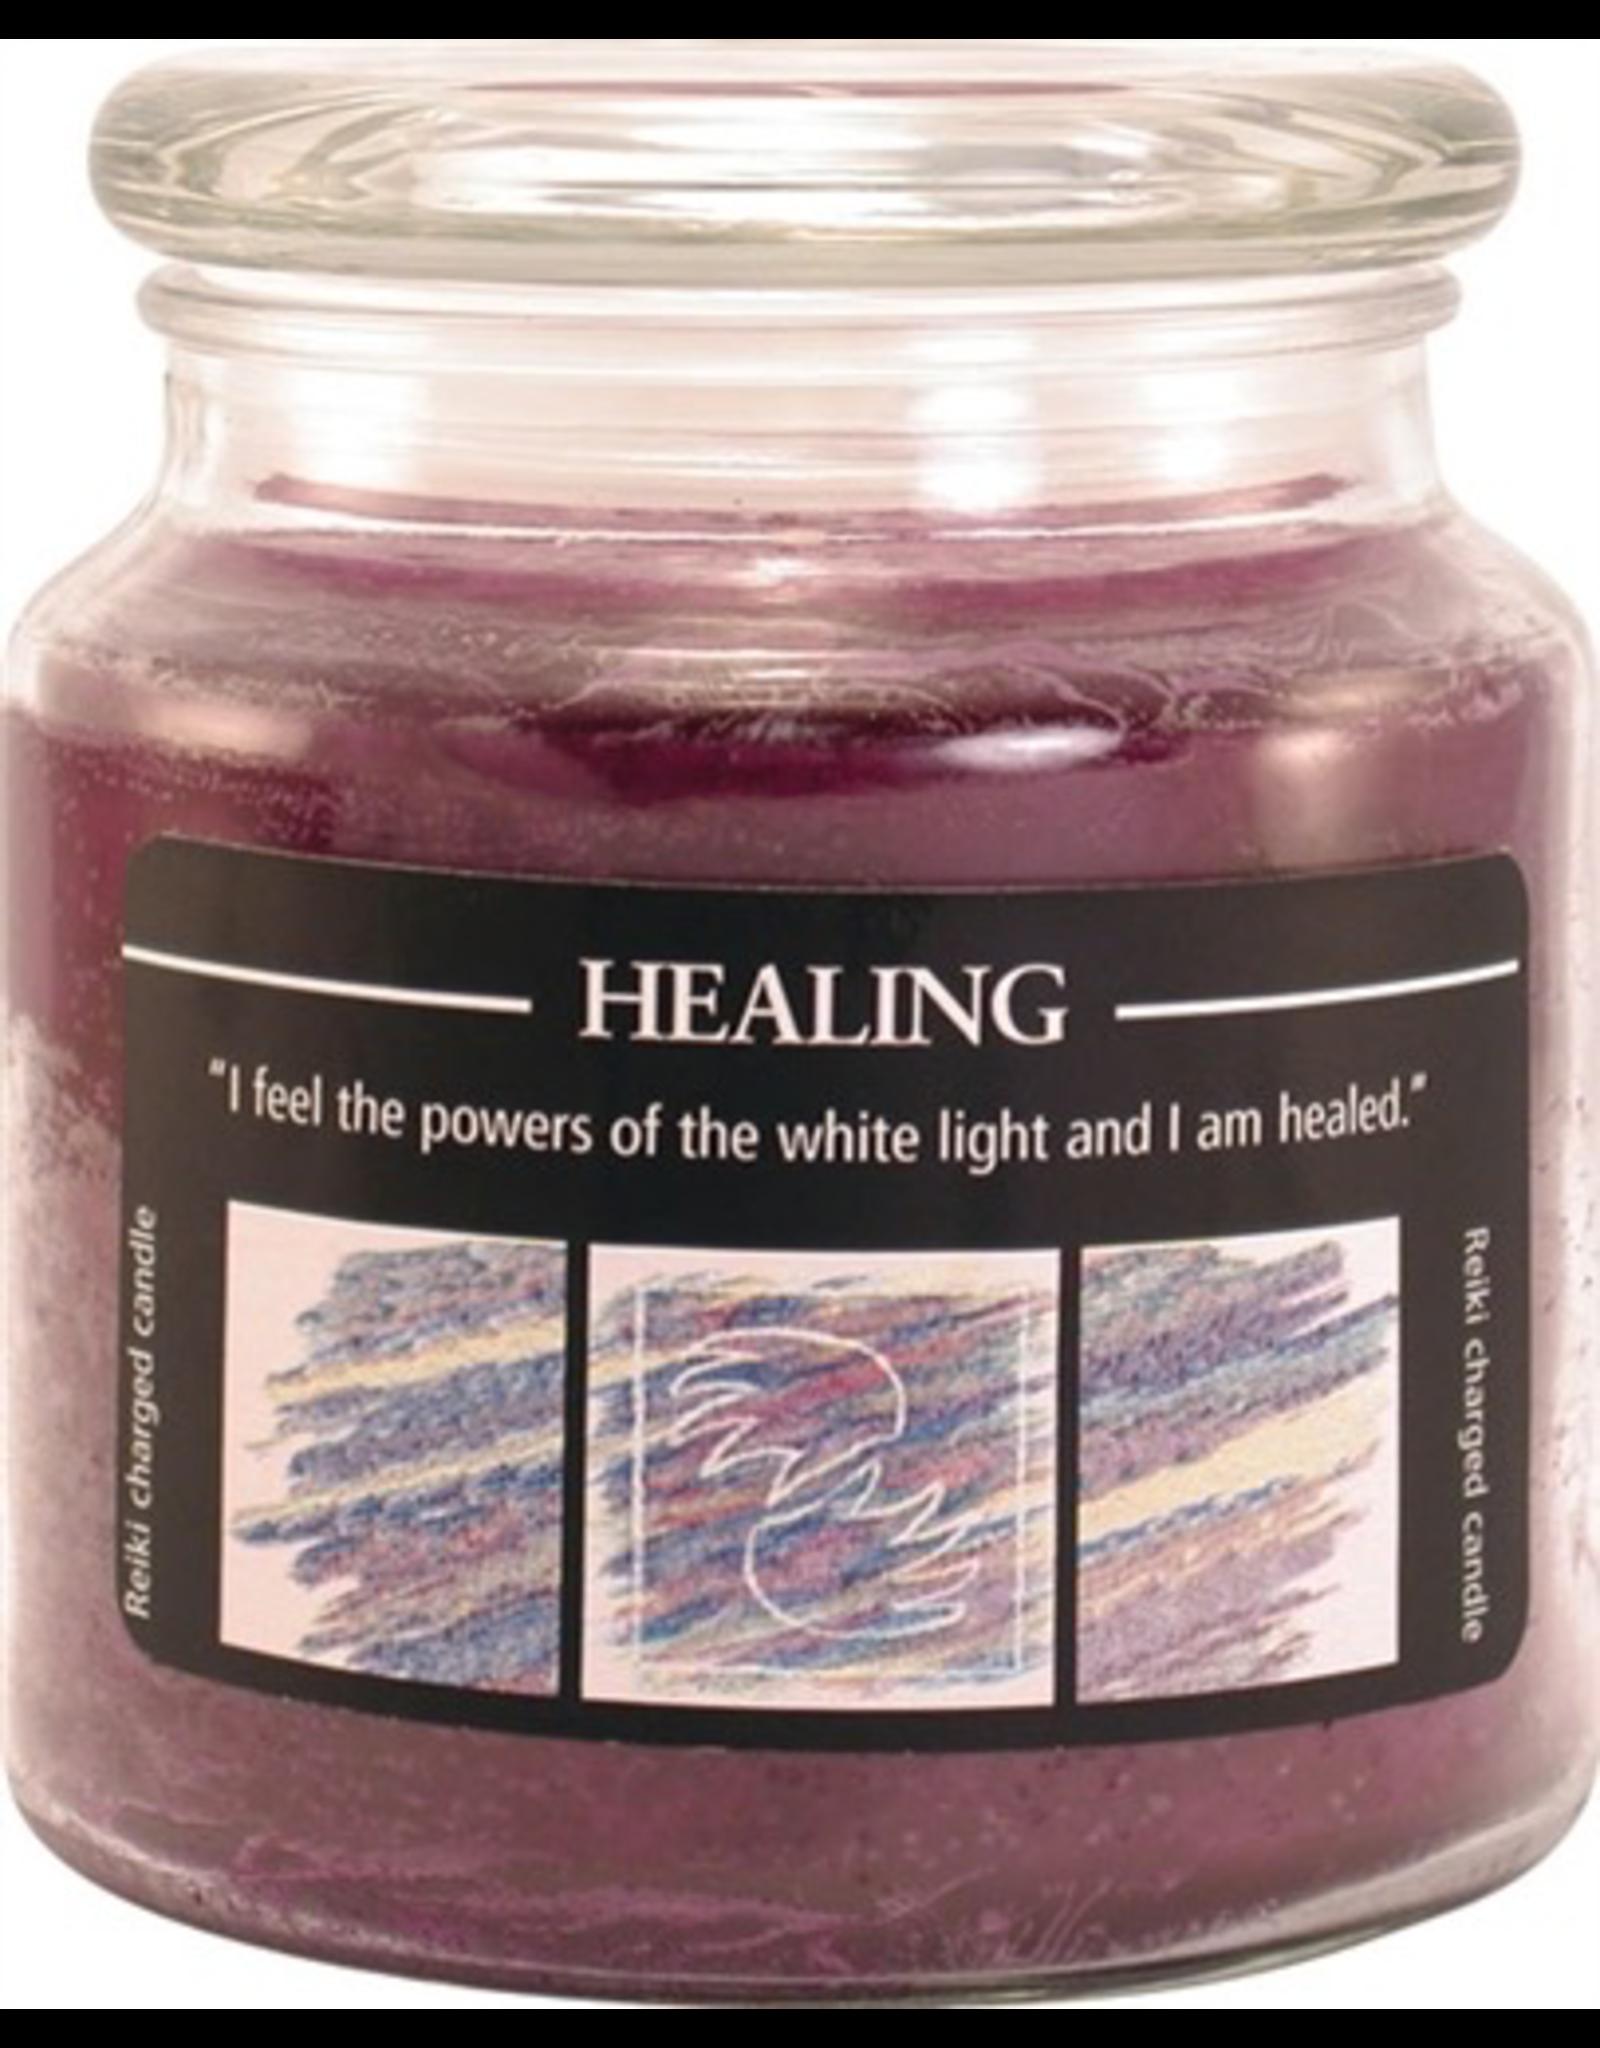 Crystal Journey 16 oz Healing Jar Candle